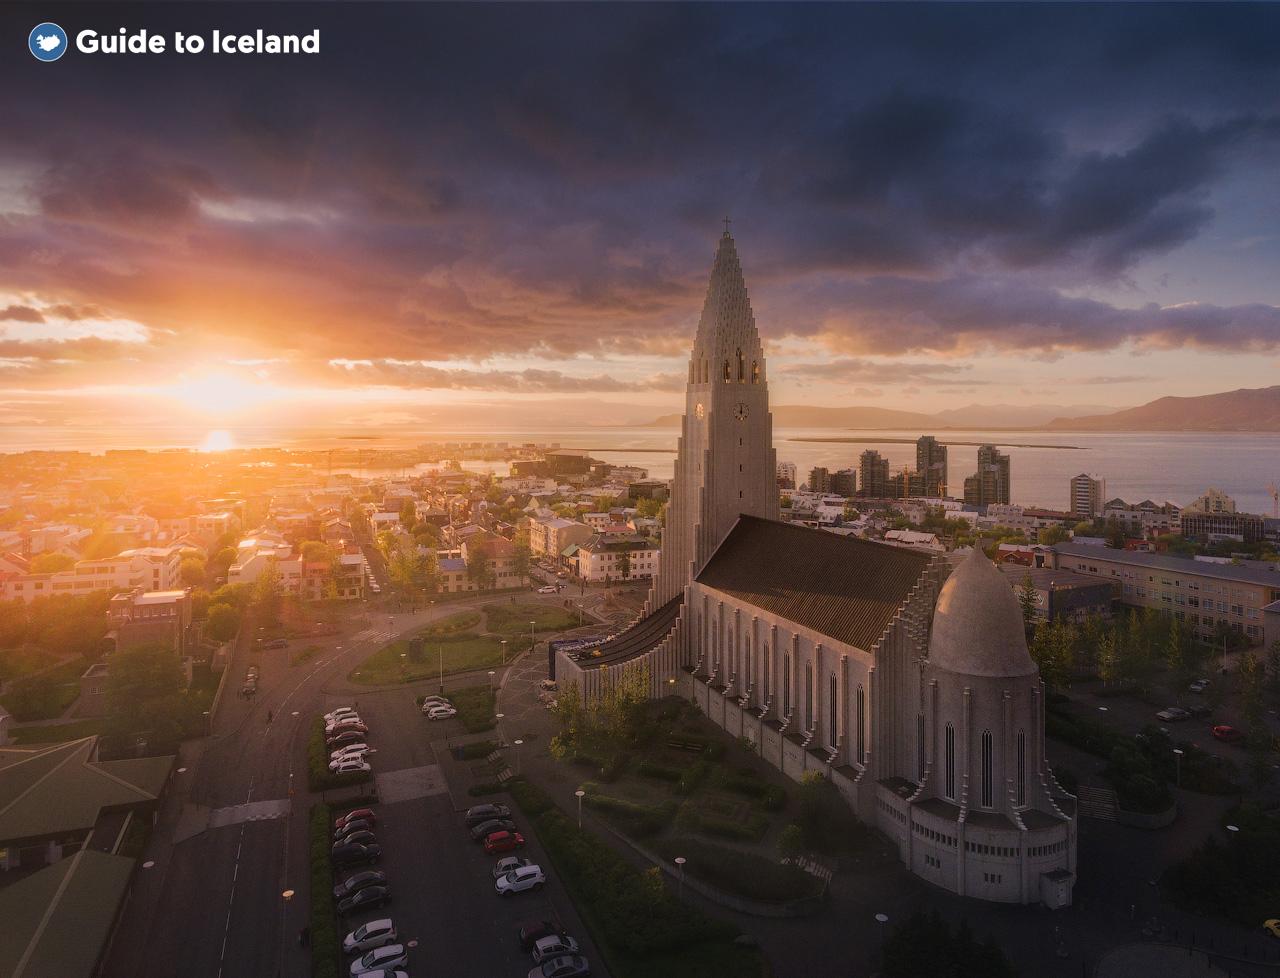 An overhead shot of Hallgrimskirkja Church in downtown Reykjavik.